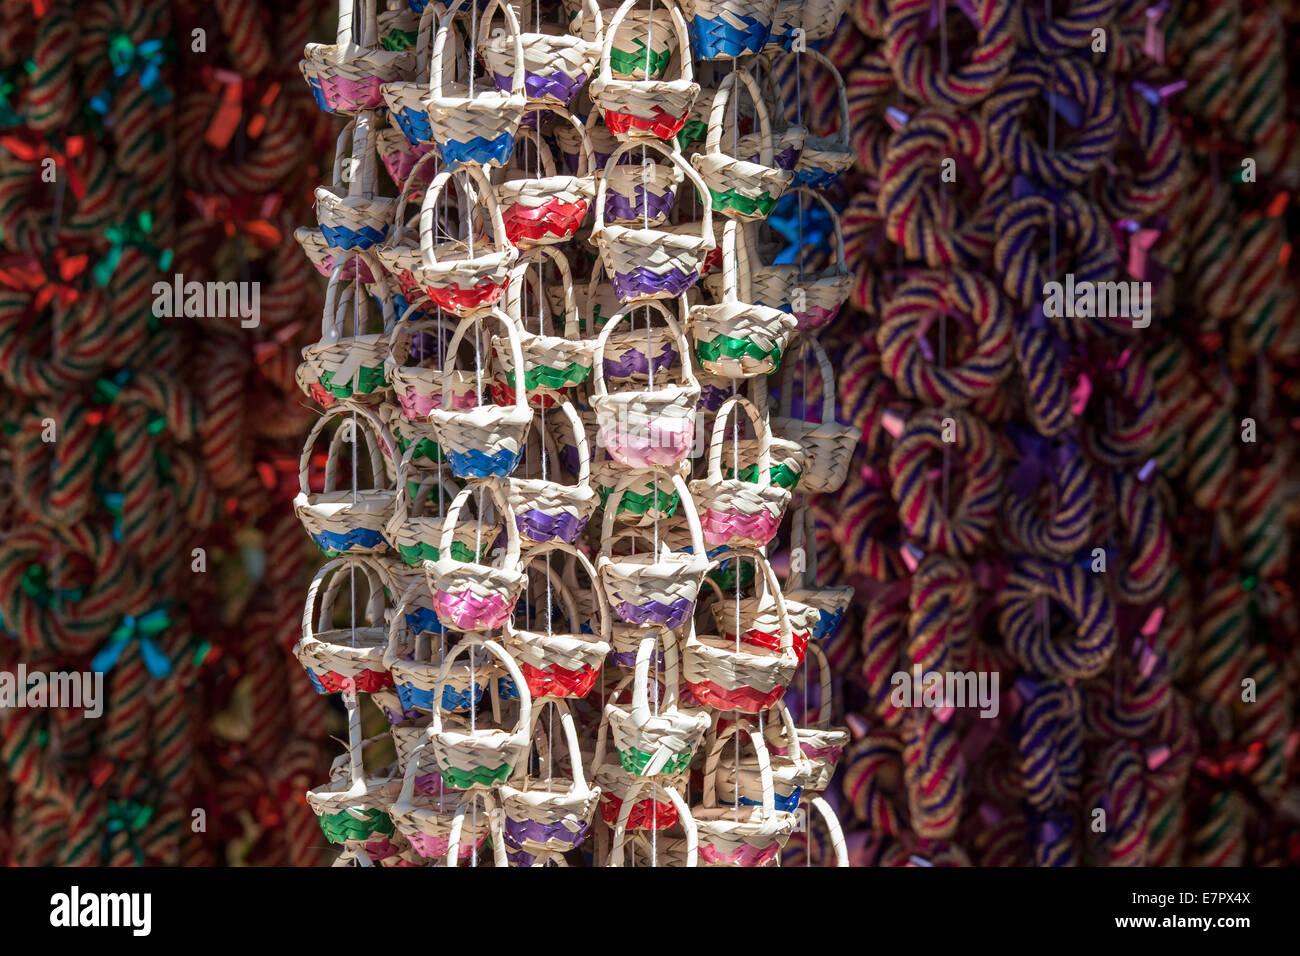 Tiny decorative baskets made of straw hang outside a market in Tzintzuntzan, Michoacan, Mexico. - Stock Image